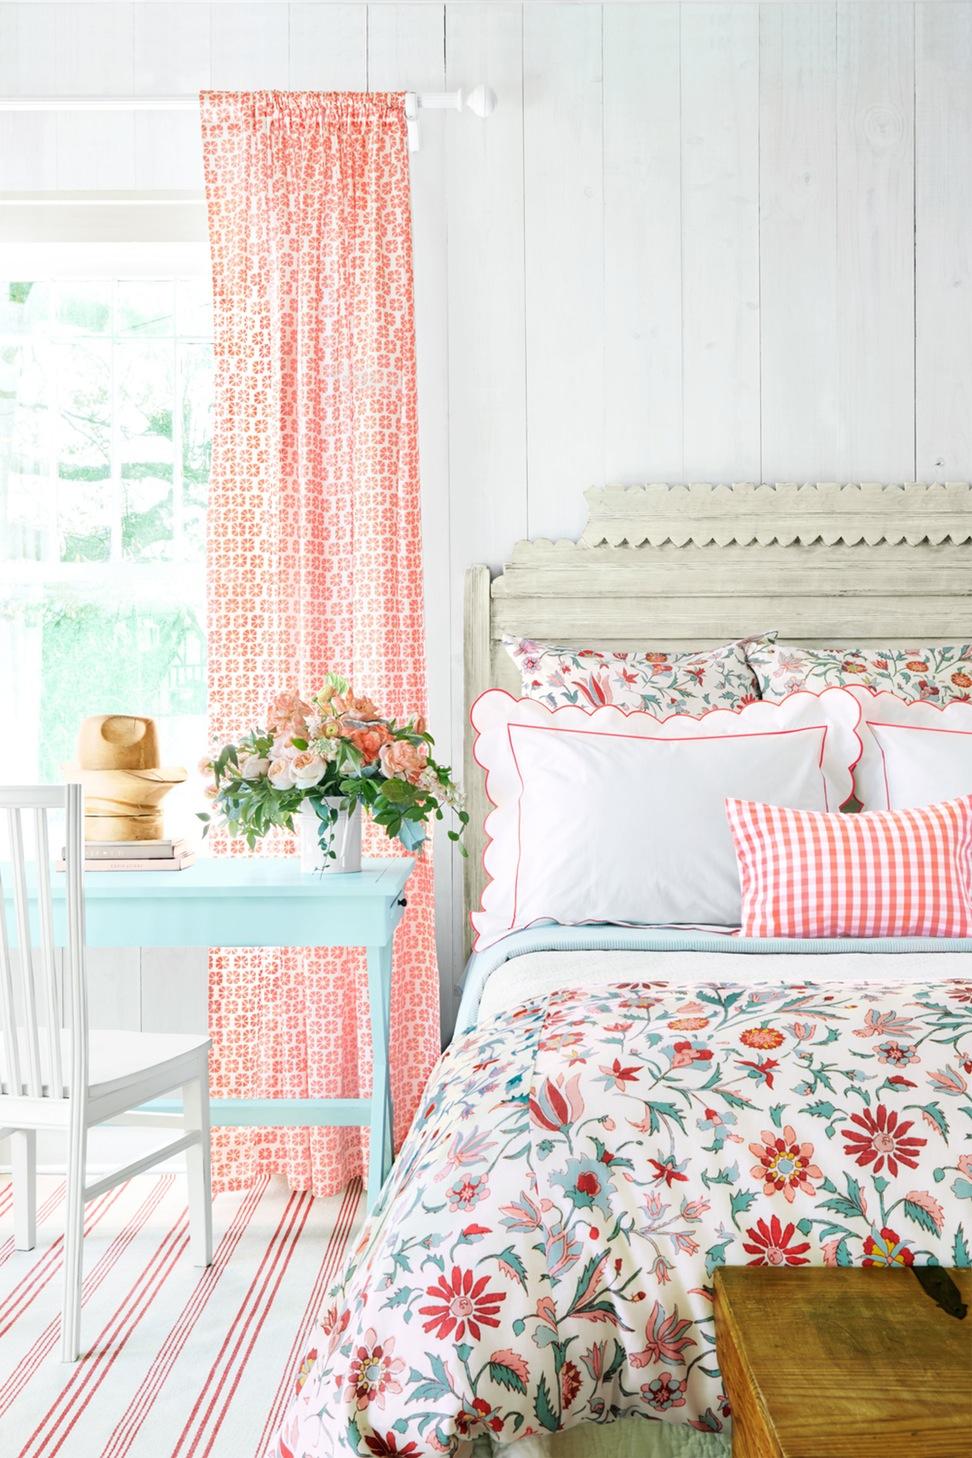 101-bedroom-decorating-ideas-in-2016-designs-for-beautiful-bedrooms_cozy-rustic-bedroom-design_bedroom_queen-bedroom-sets-teen-furniture-4-houses-for-rent-house-modern-feng-shui-des